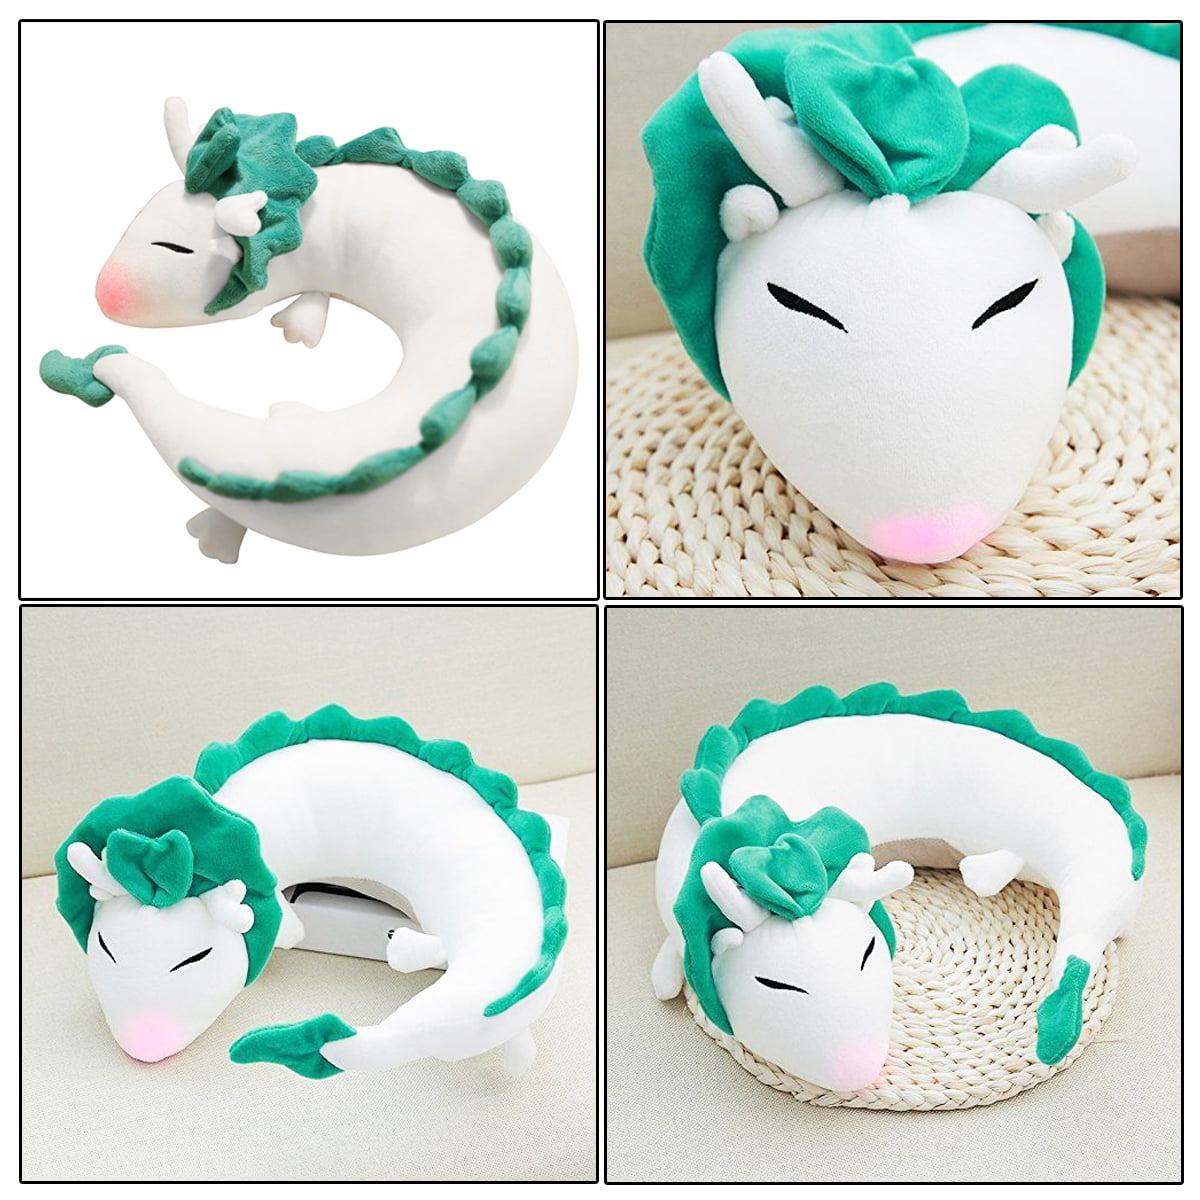 Pet Pillow Anime Spirited Away White Dragon Haku Cute Doll Stuffed Animal Plush Toy Anime Pillow Soft Pillow Neck U Shape Walmart Com Walmart Com